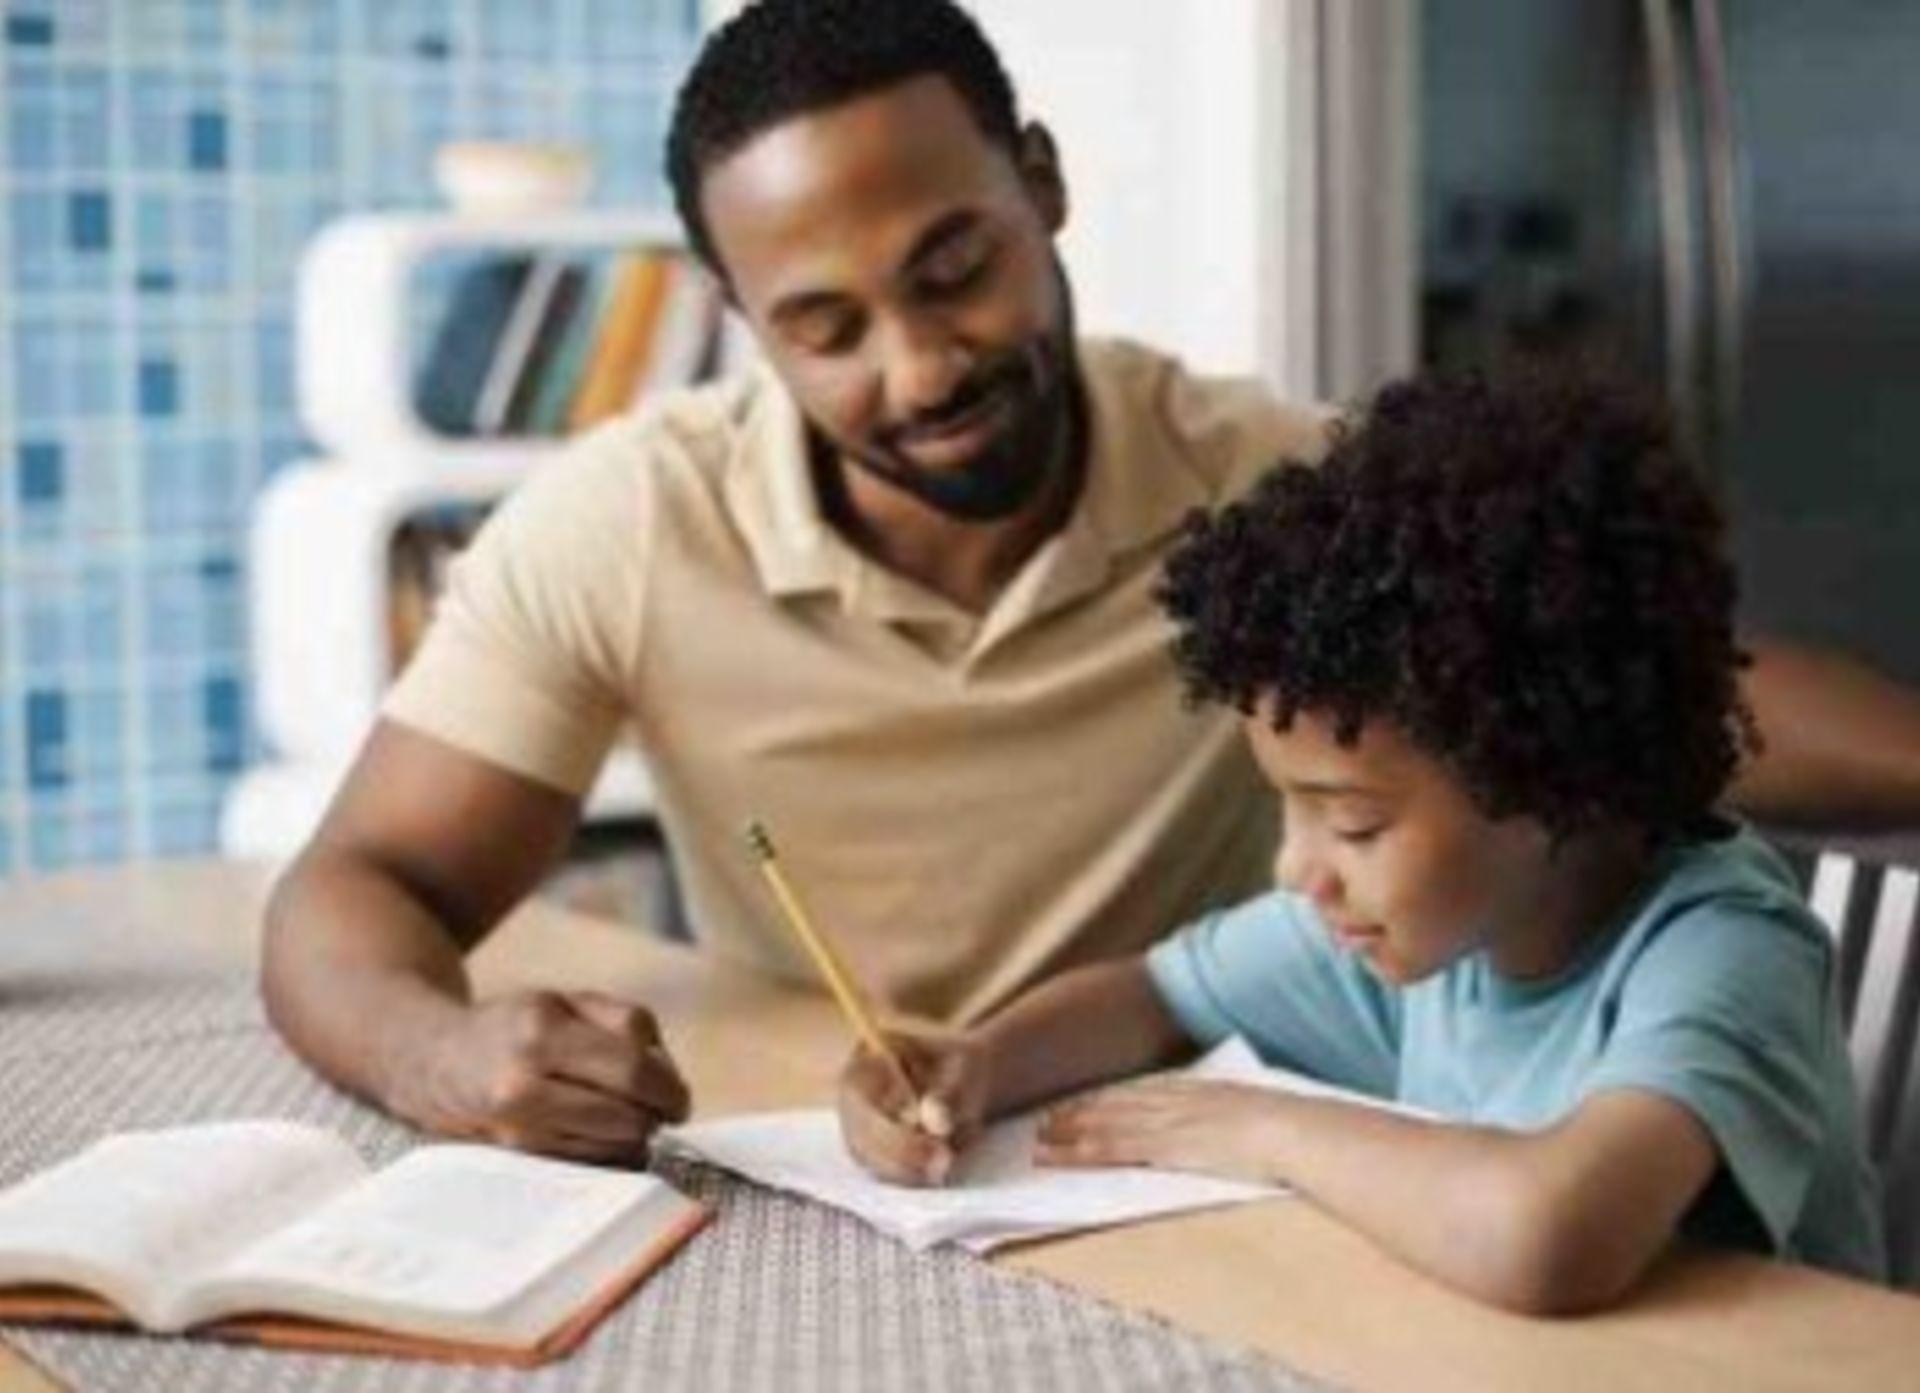 Simple Ways to Raise Successful Kids